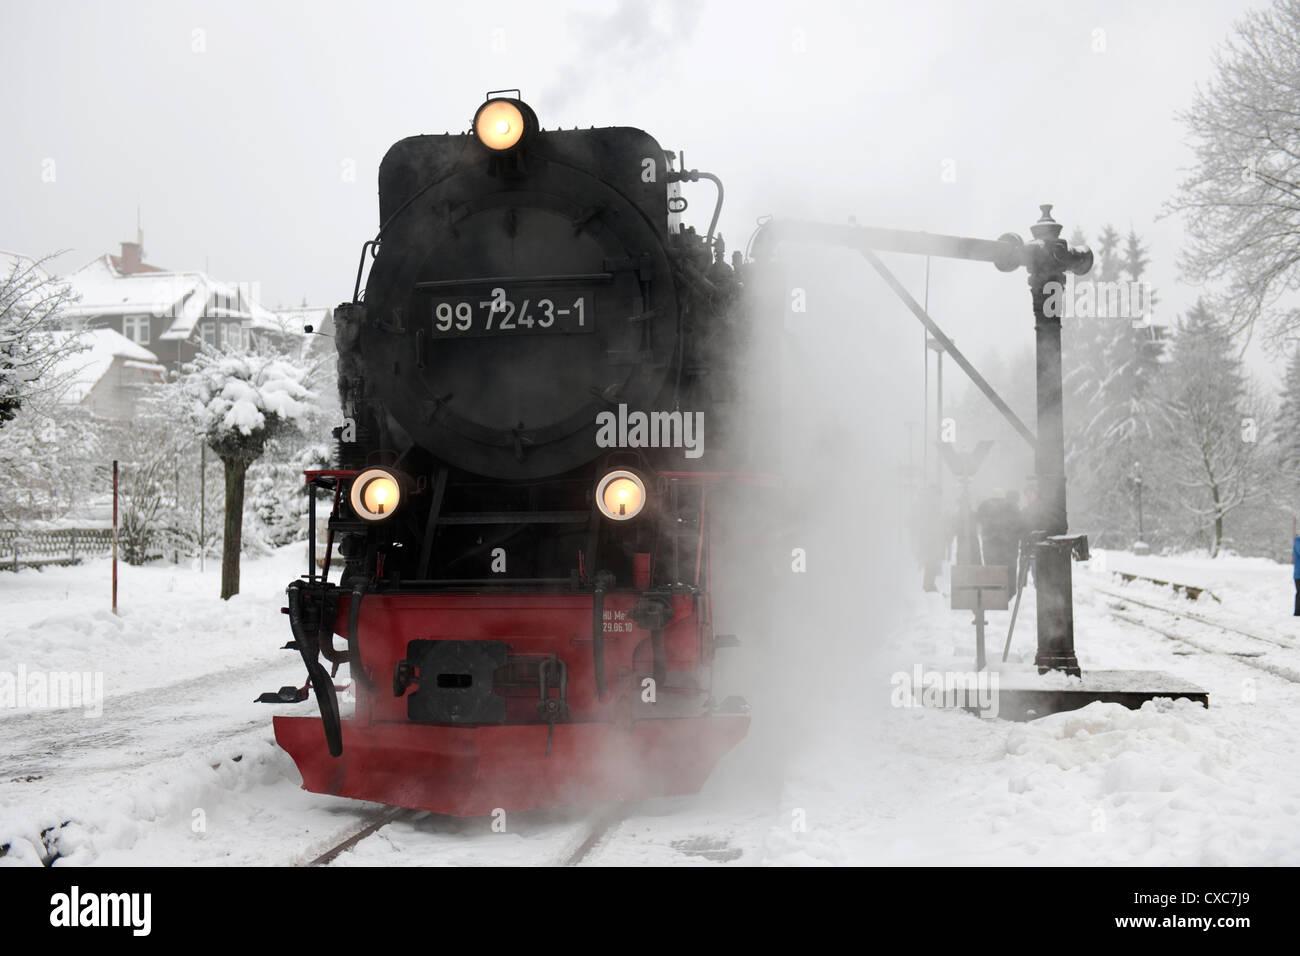 Narrow Gauge Steam Locomotives hauled Train at Schierke -4 - Stock Image